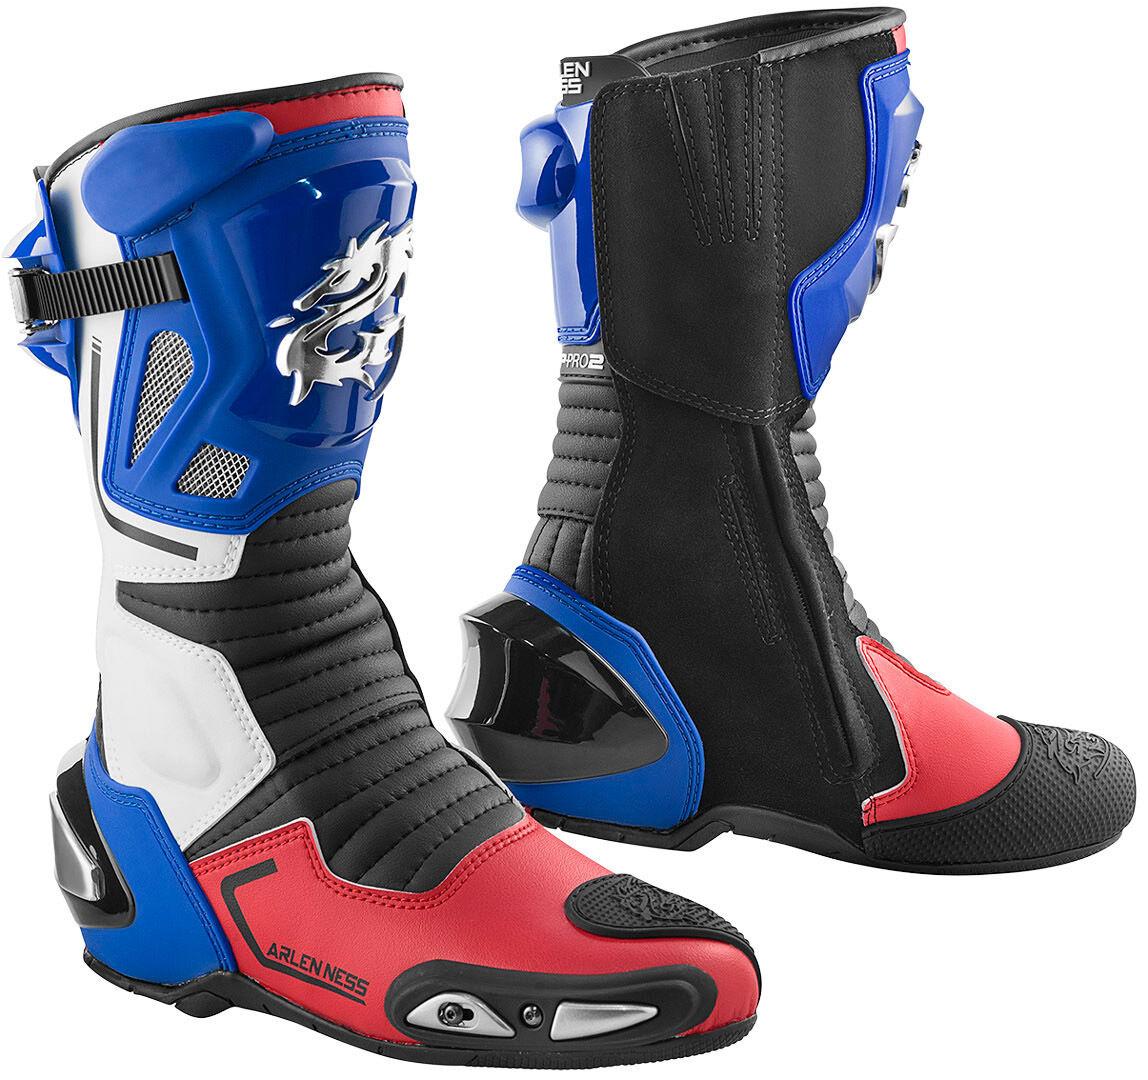 Arlen Ness Sugello Bottes de moto Blanc Rouge Bleu taille : 37